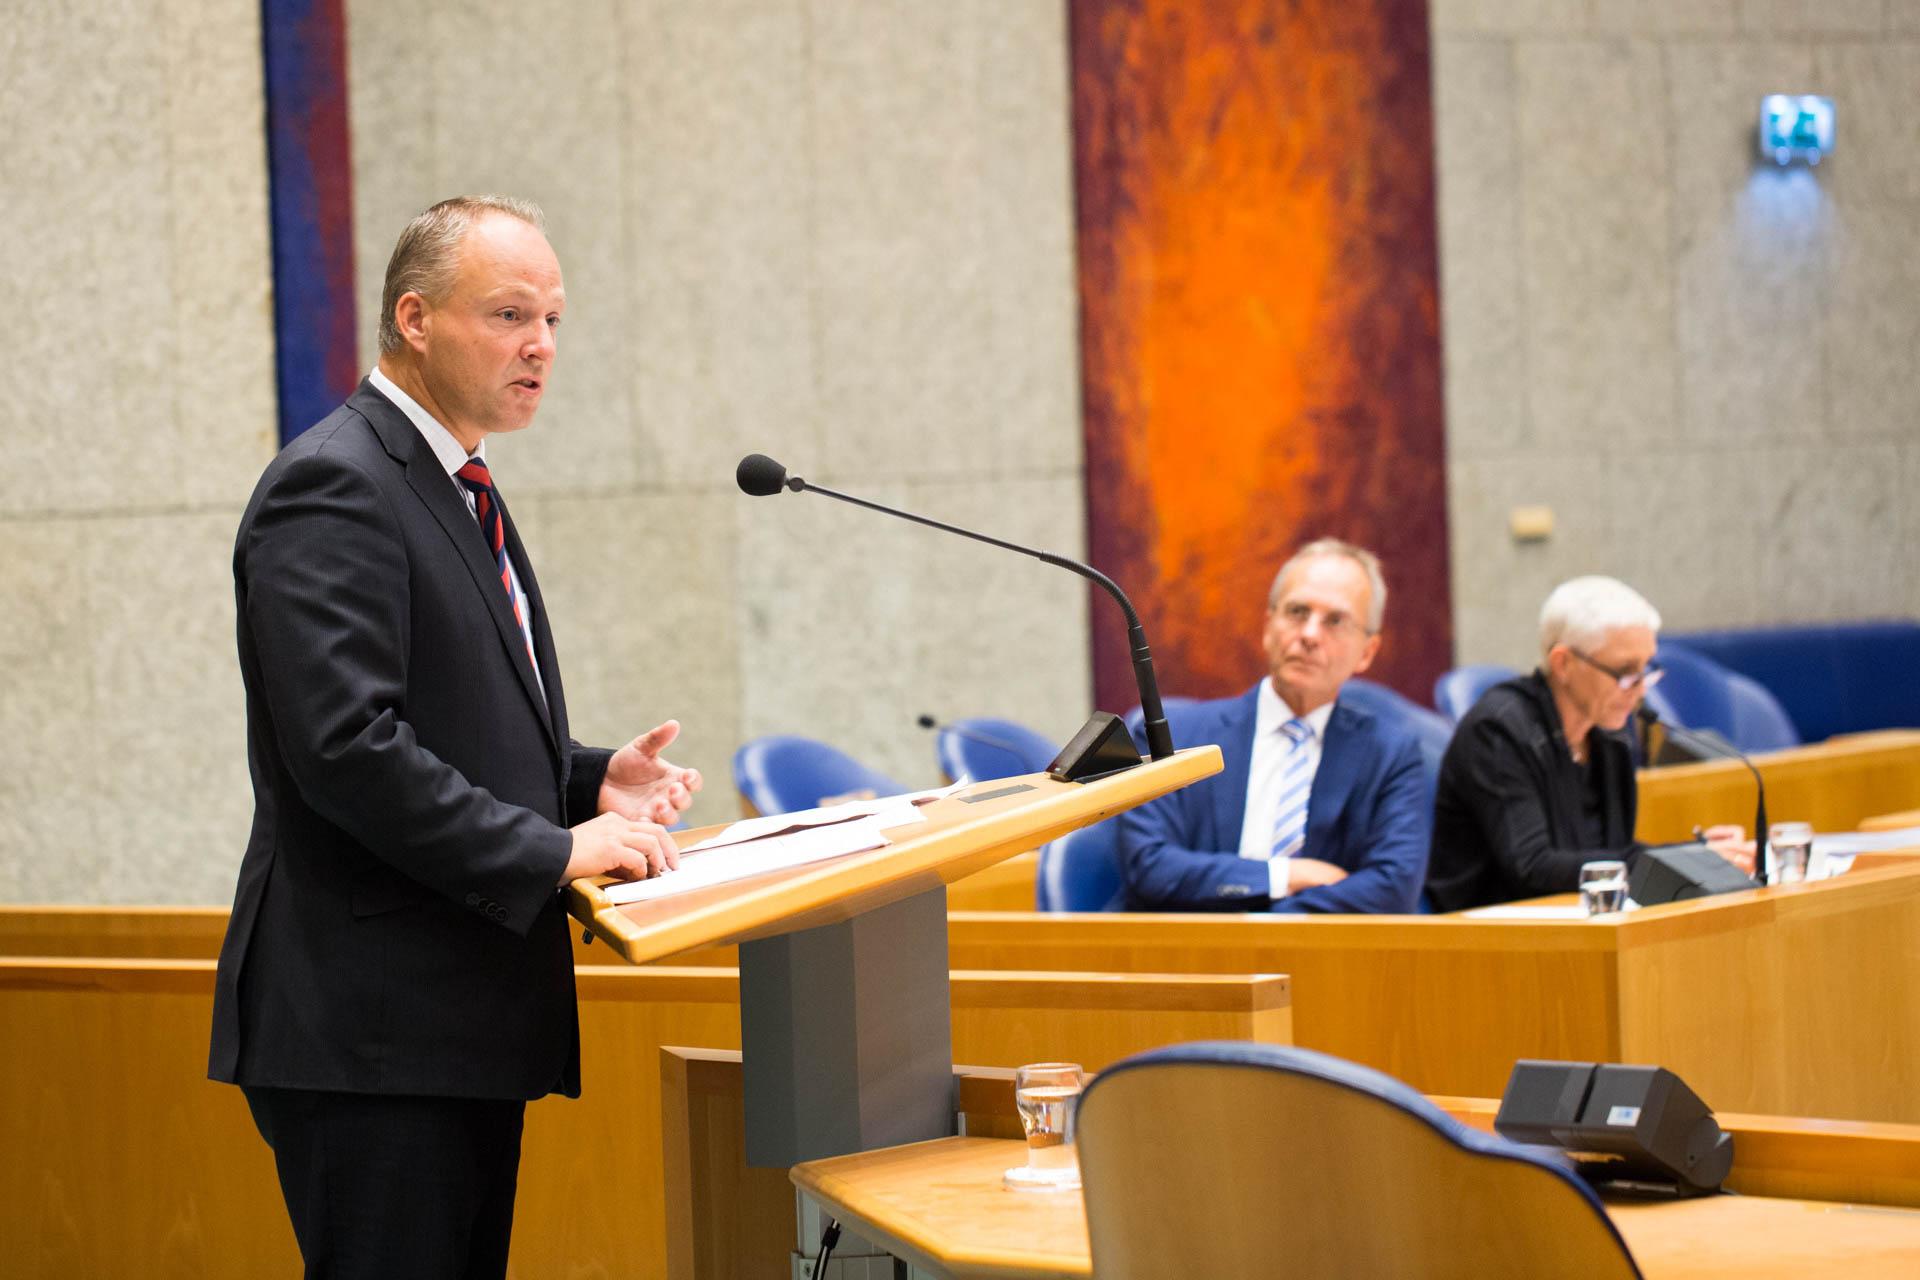 Tweede Kamerdebat Klimaatzaak Urgenda 24 september 2015